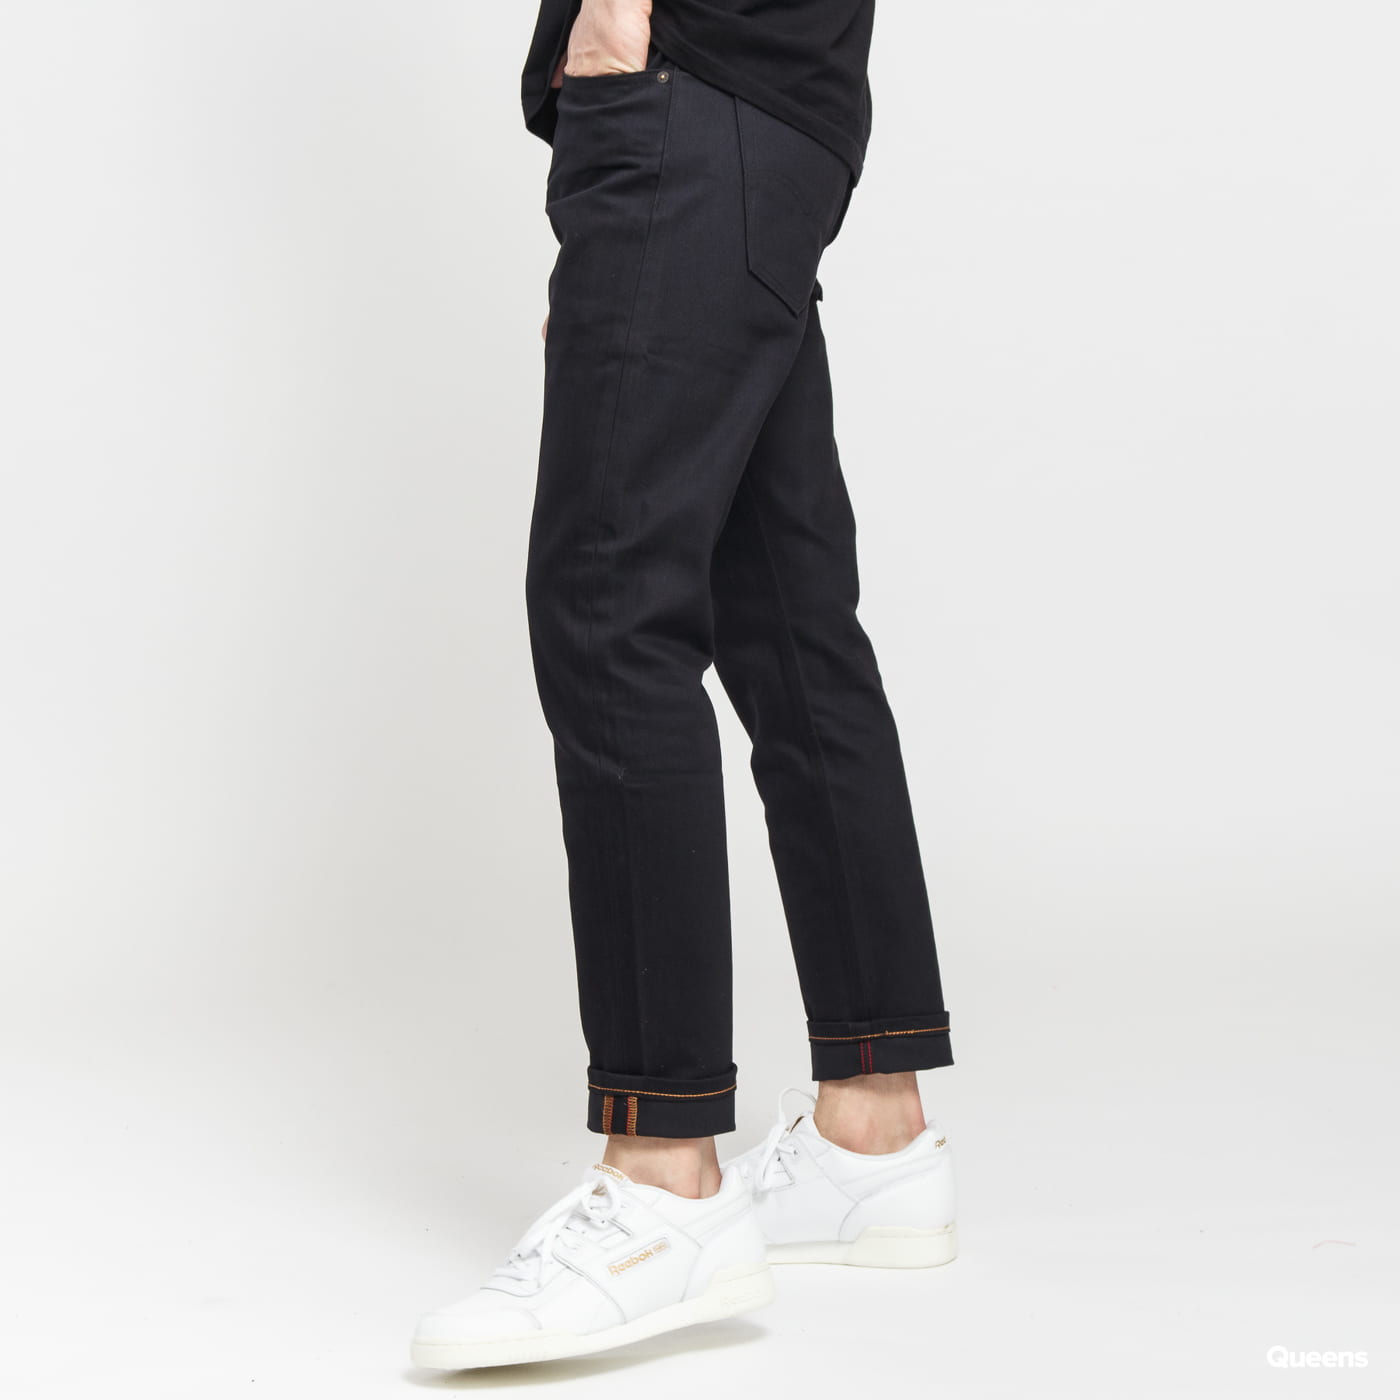 Levi's ® Skate 512 Slim 5 Pocket SE caviar bull denim